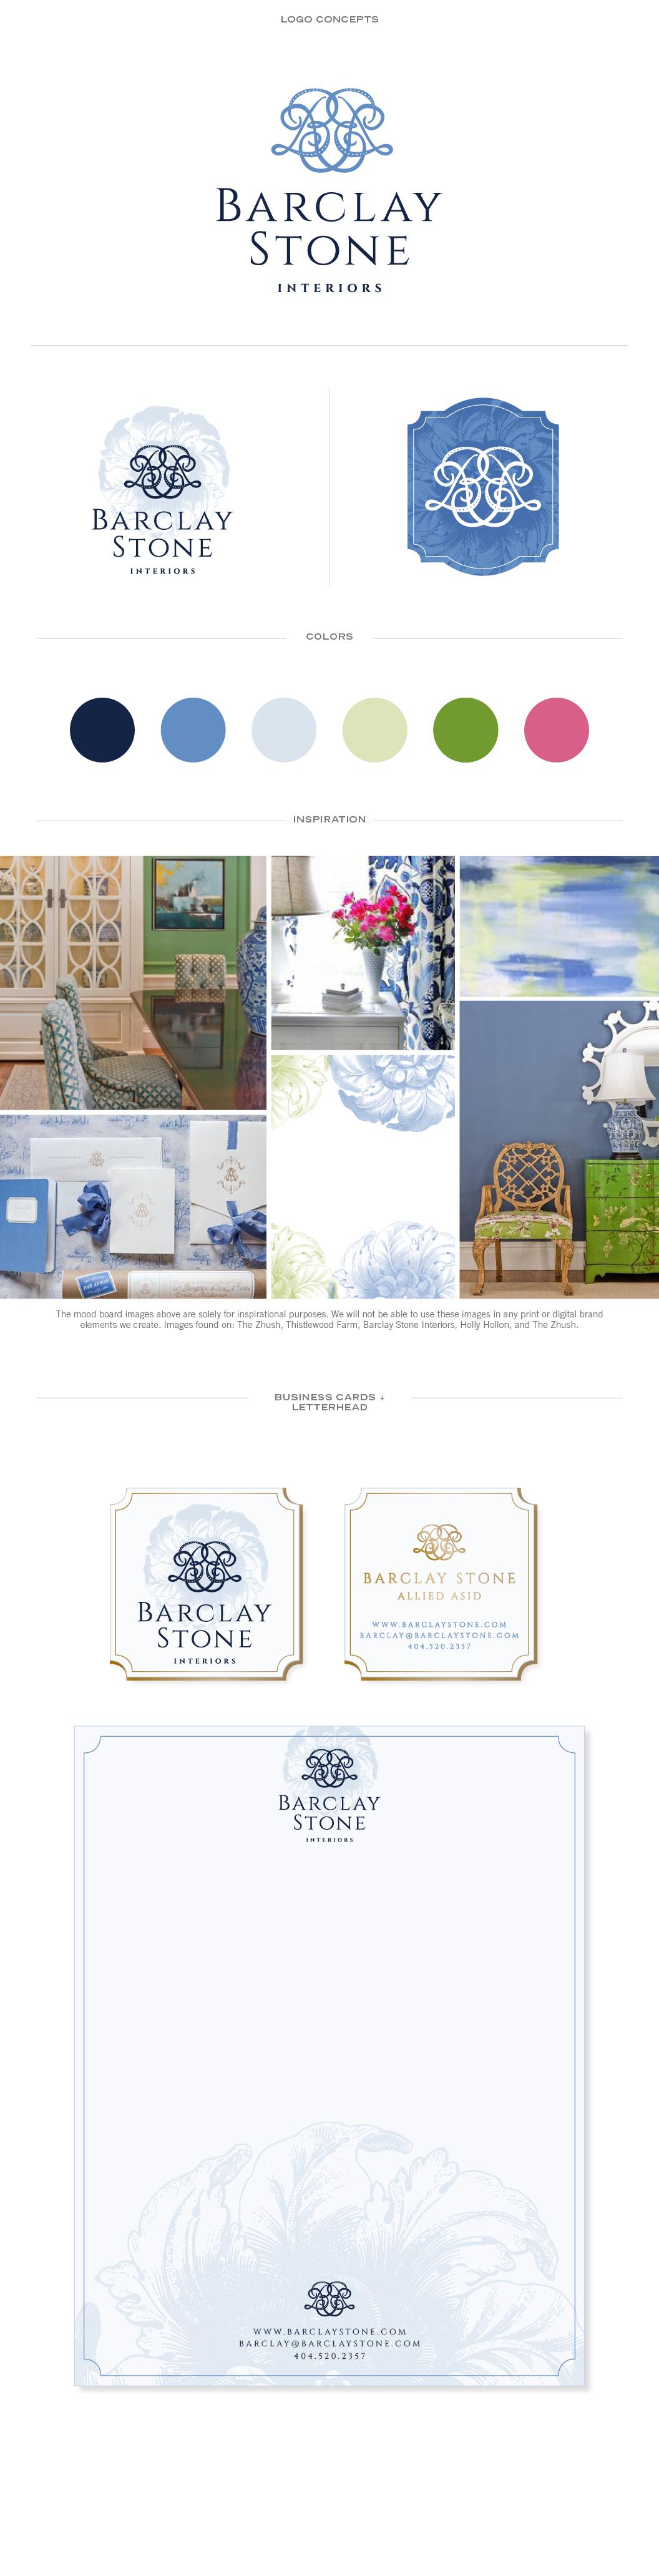 Interior Designer Branding: Barclay Stone Interiors | Doodle Dog